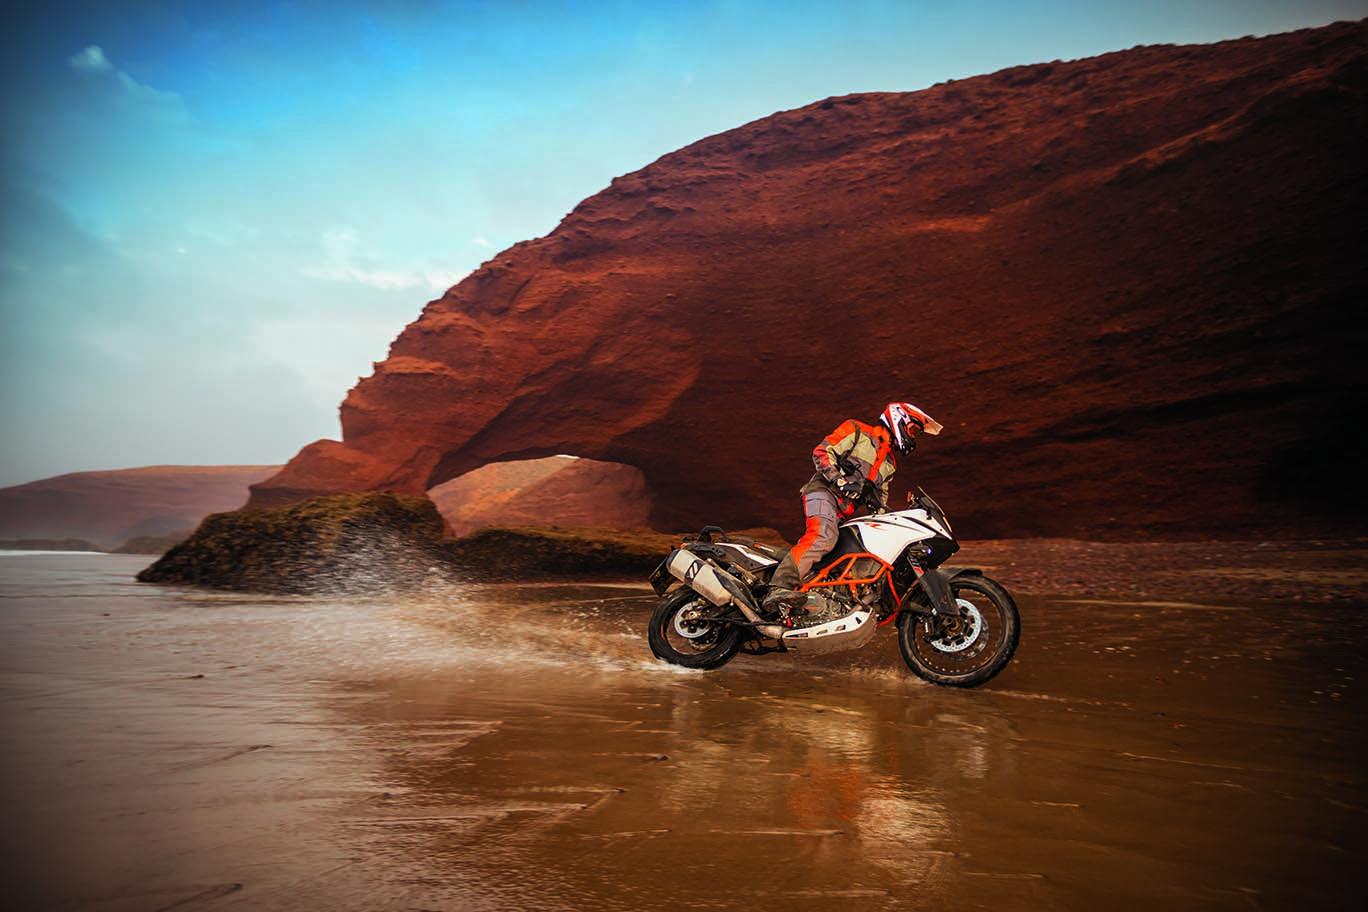 KTM 1090 Adventure R - A Milder Insane ADV Bike - Asphalt ...